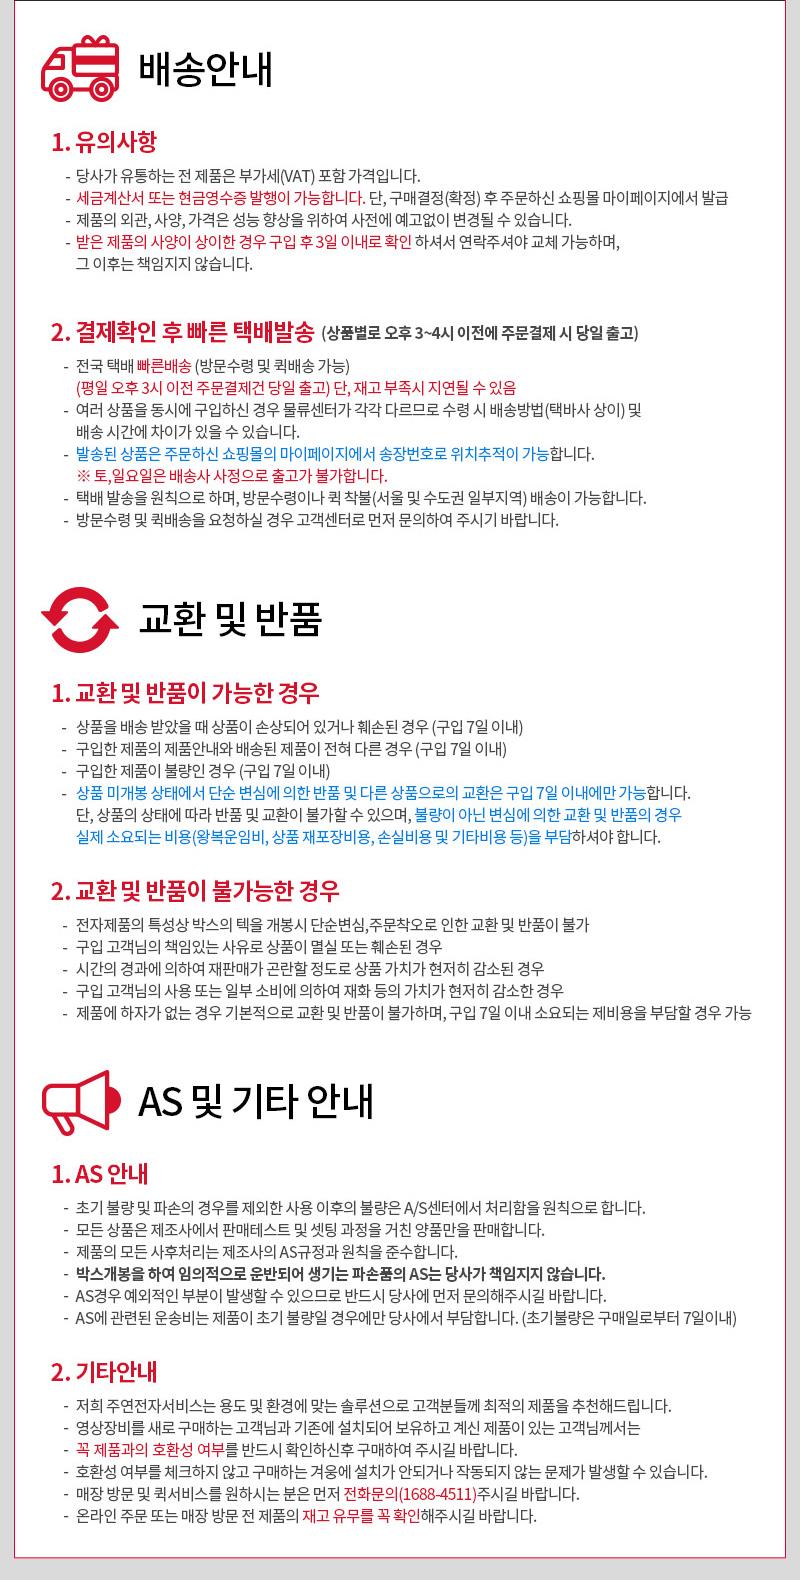 JOOYONCCTV_detail_06.jpg